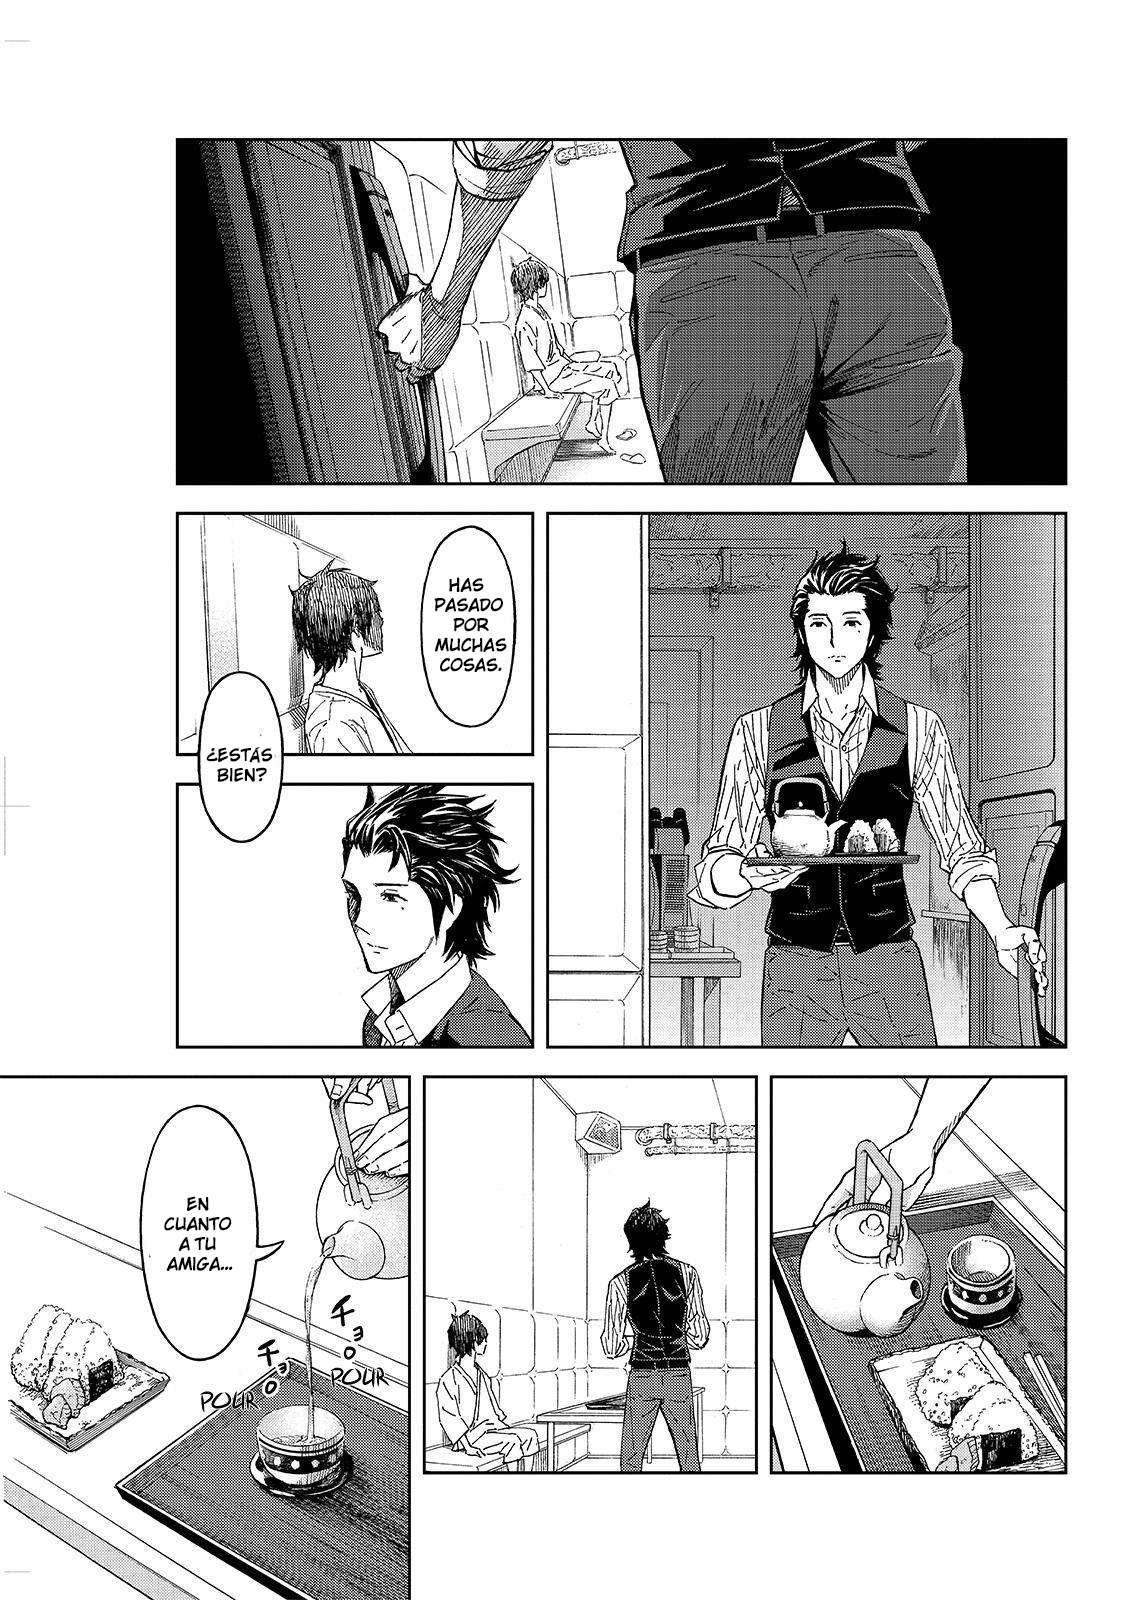 https://c5.ninemanga.com/es_manga/54/16310/392138/367ac971f08b41f2fe1248a63e28e837.jpg Page 10